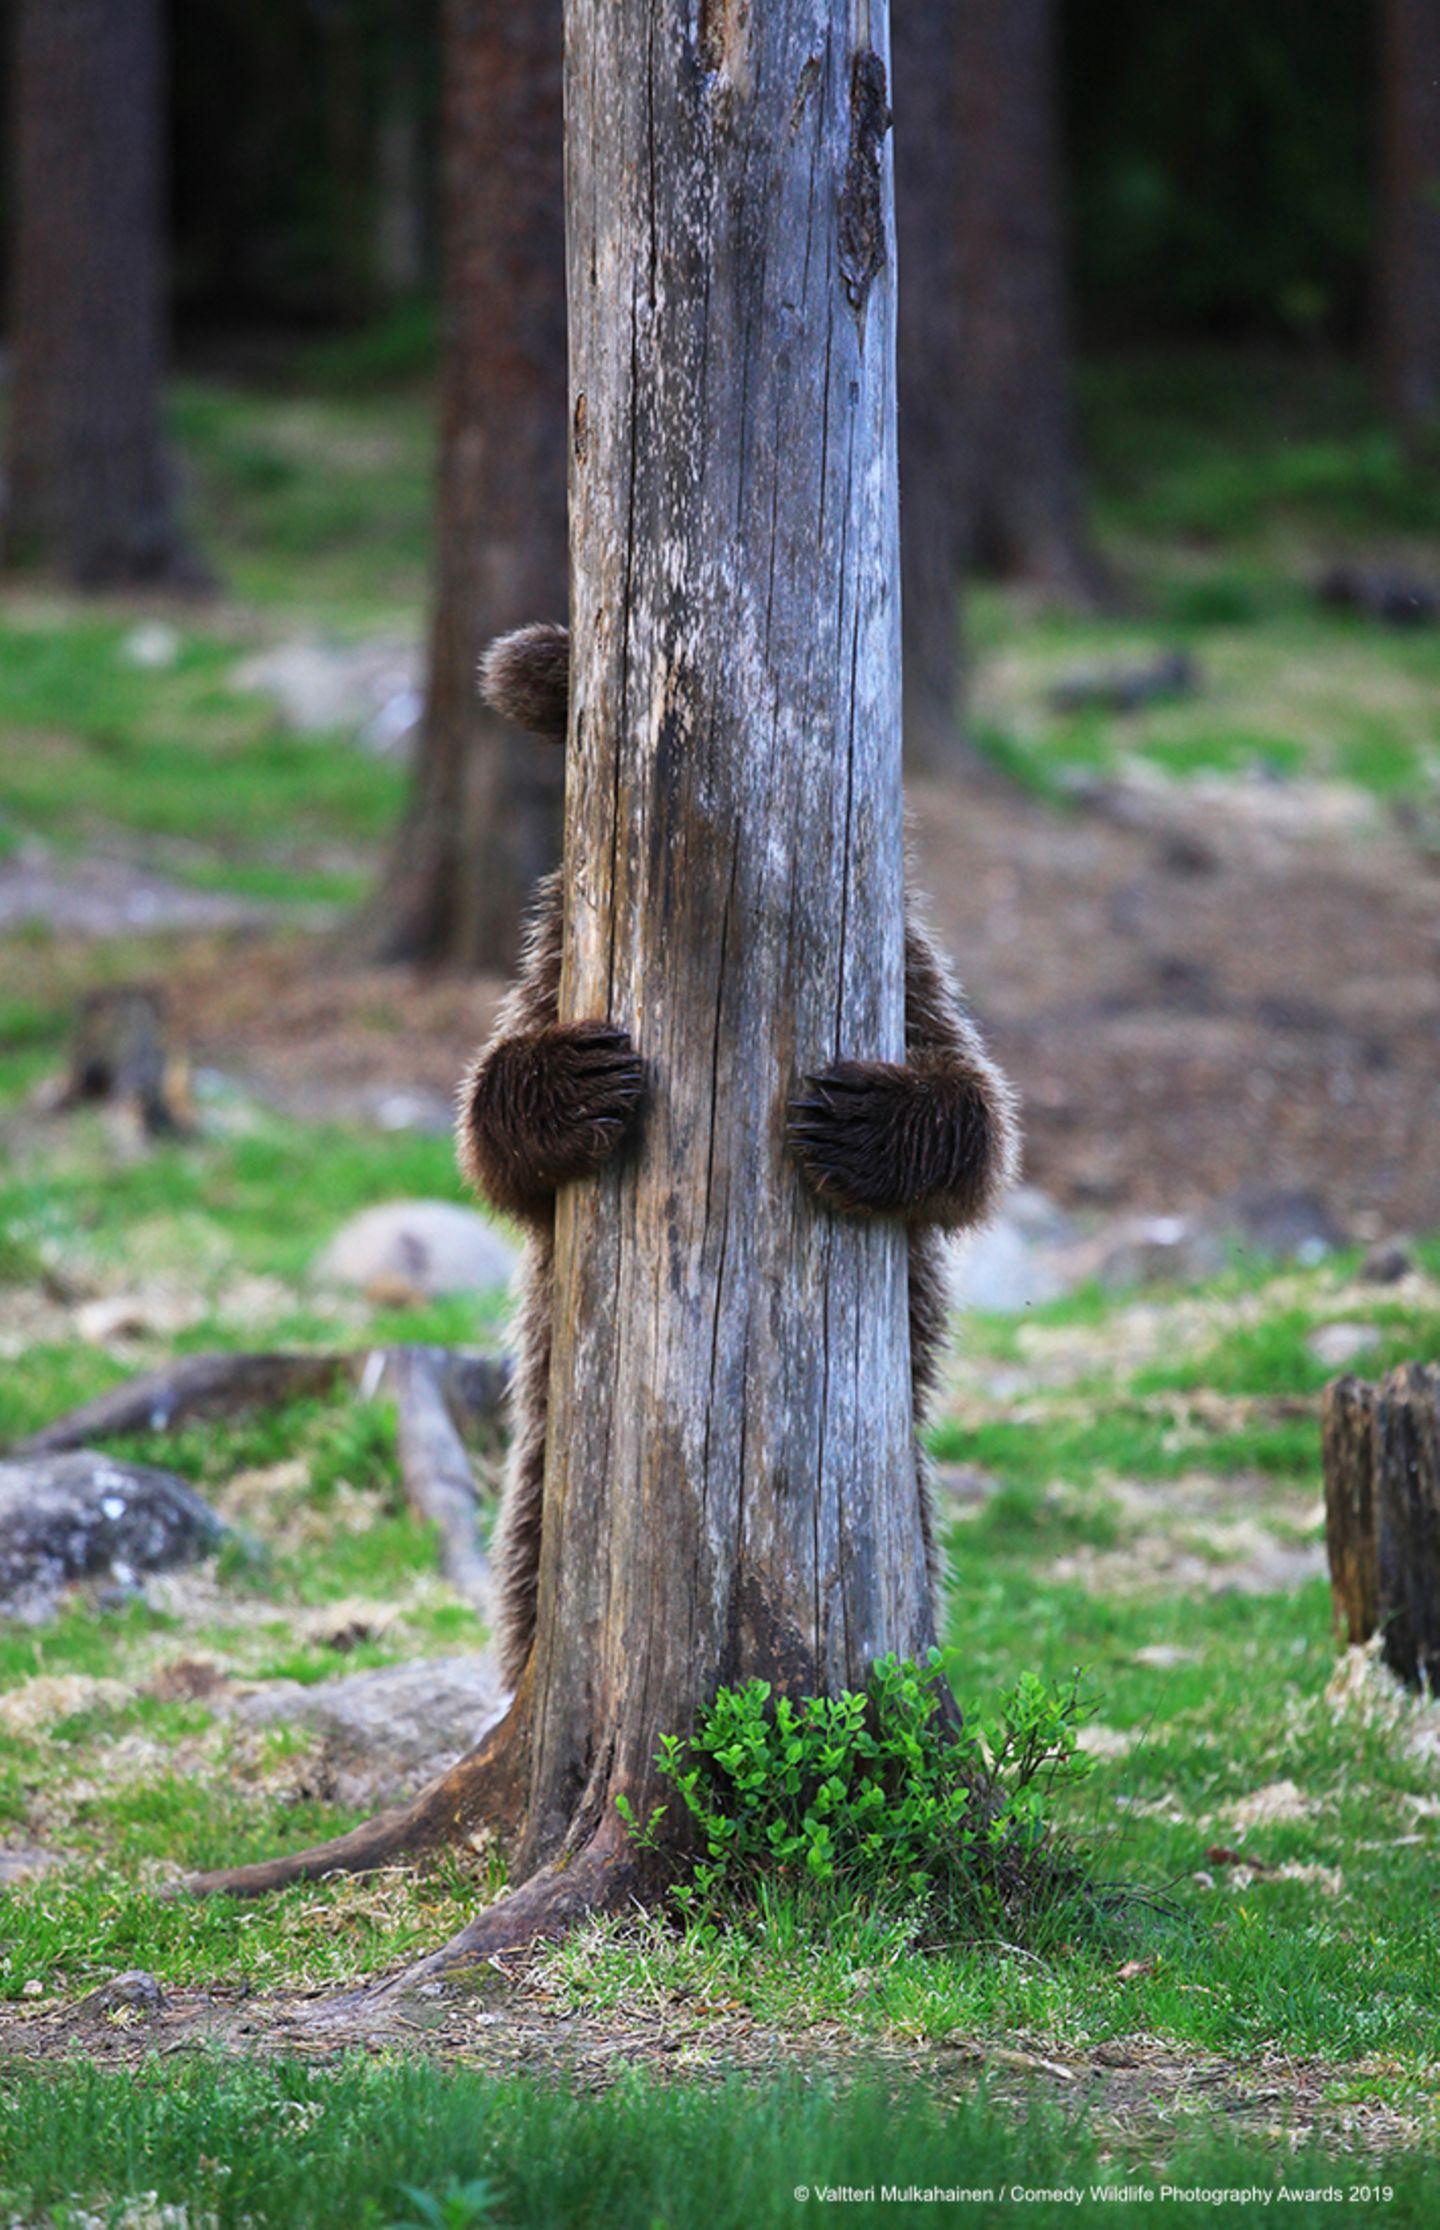 Comedy Wildlife Awards 2019: Bär hinter einem Baum